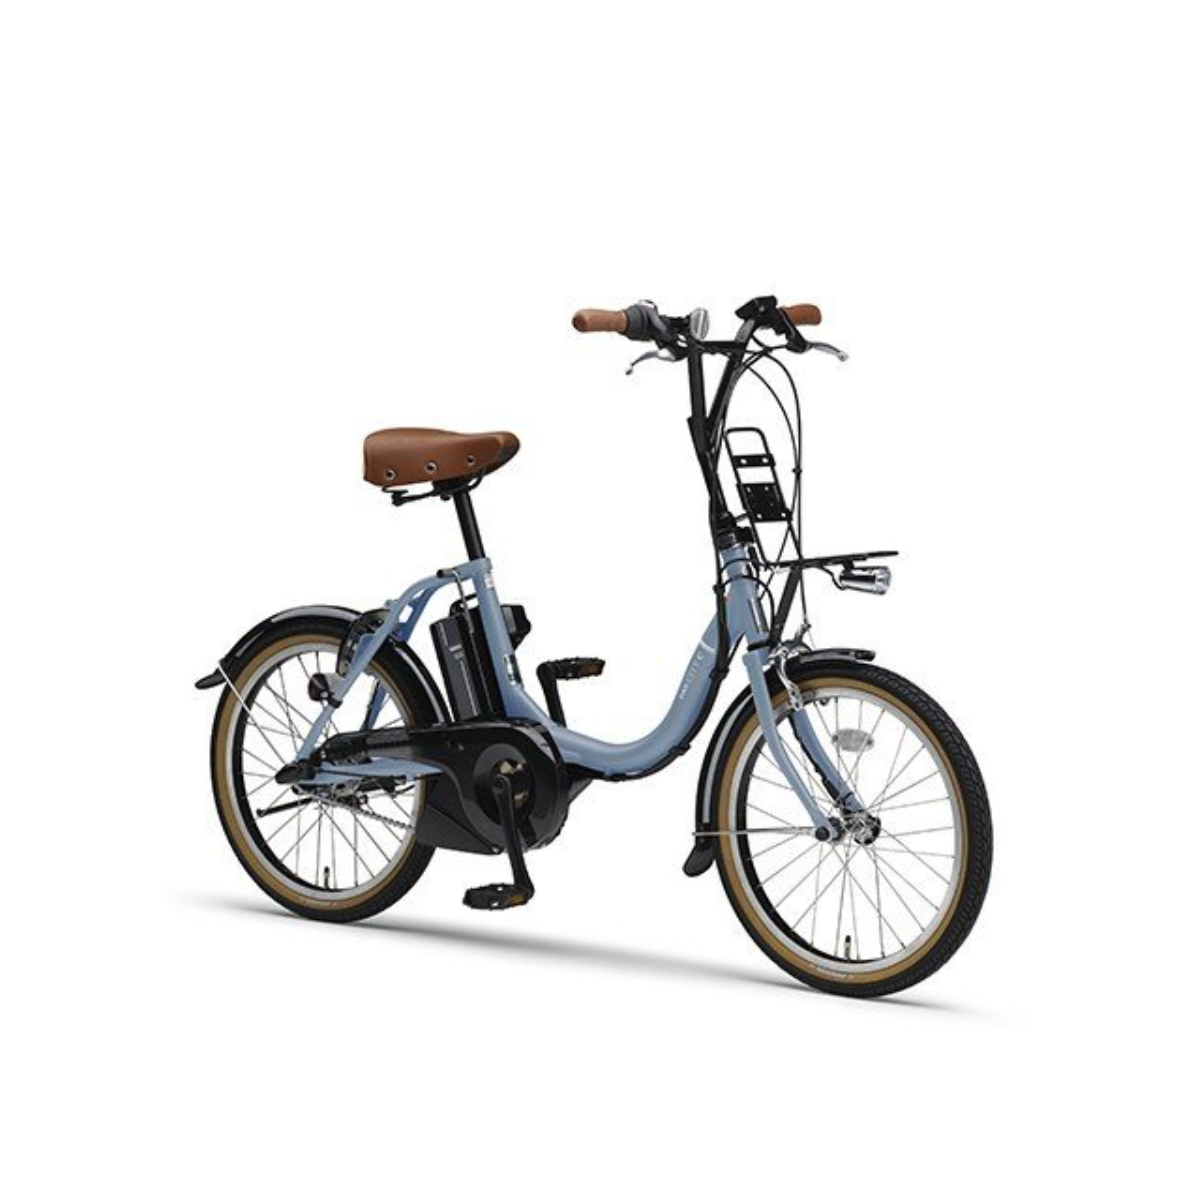 YAMAHA 電動アシスト自転車 PAS CITY-C PA20CC